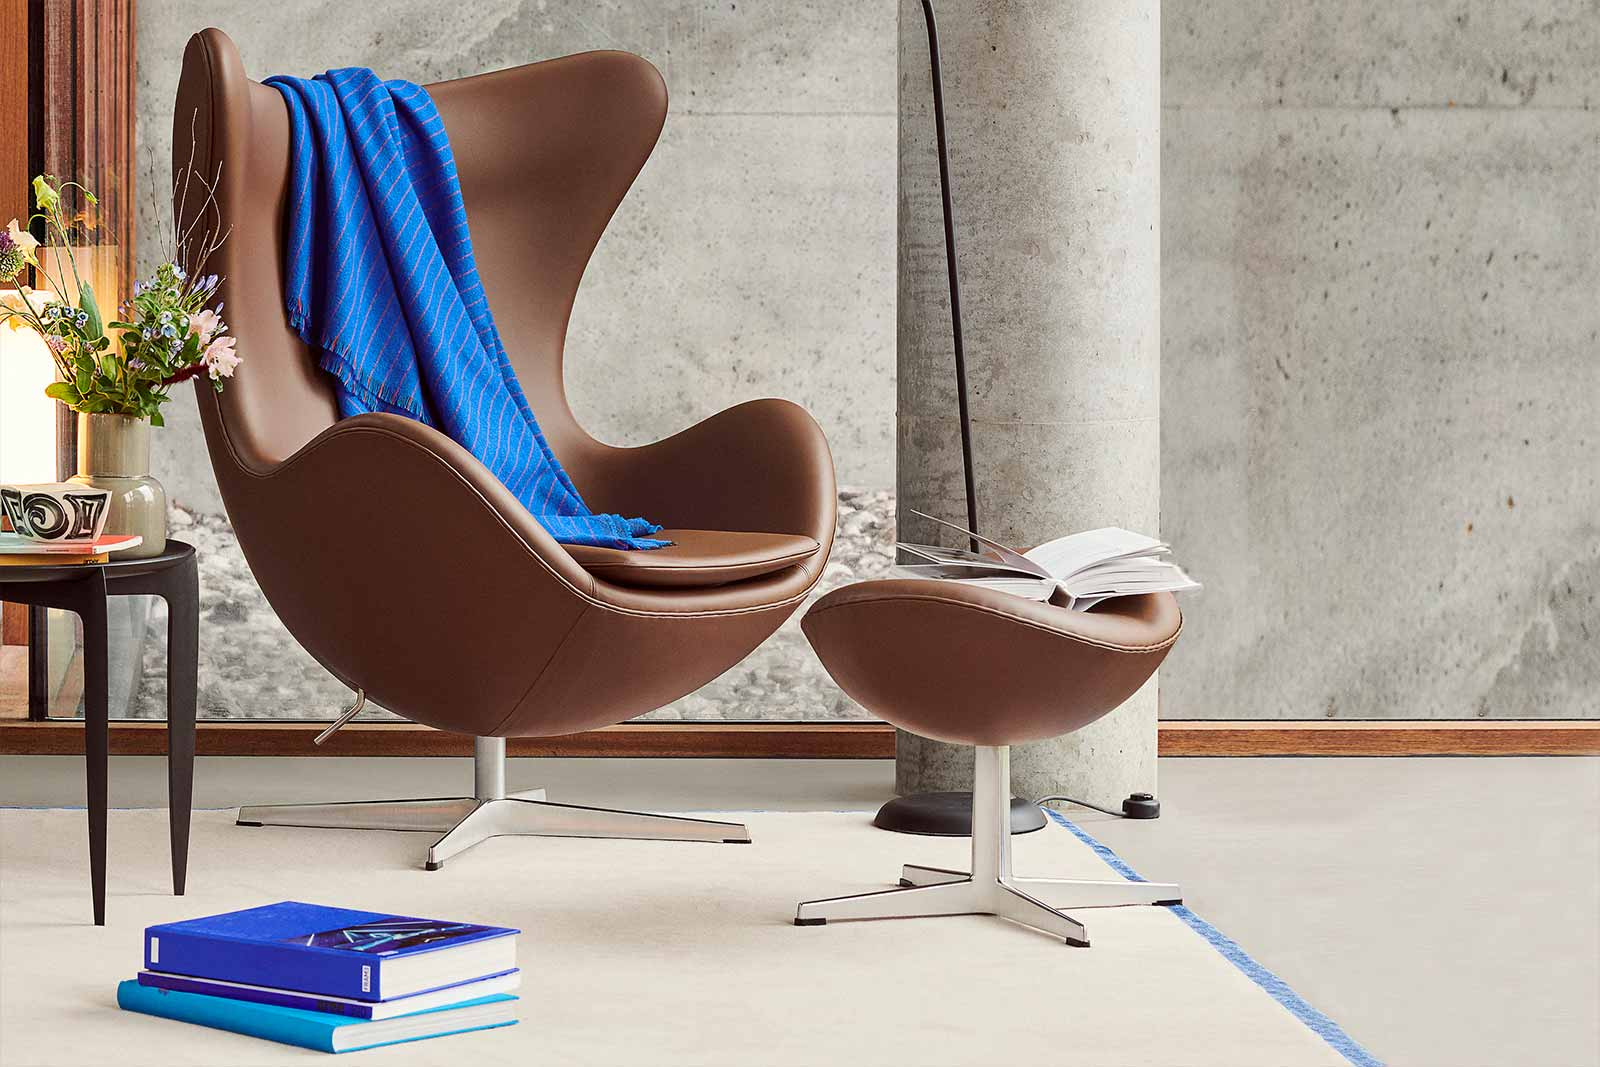 the Egg™ – Sonder-Edition 2020, Boutique Danoise Basel Daenische Designer Moebel Accessoires Wohnen News